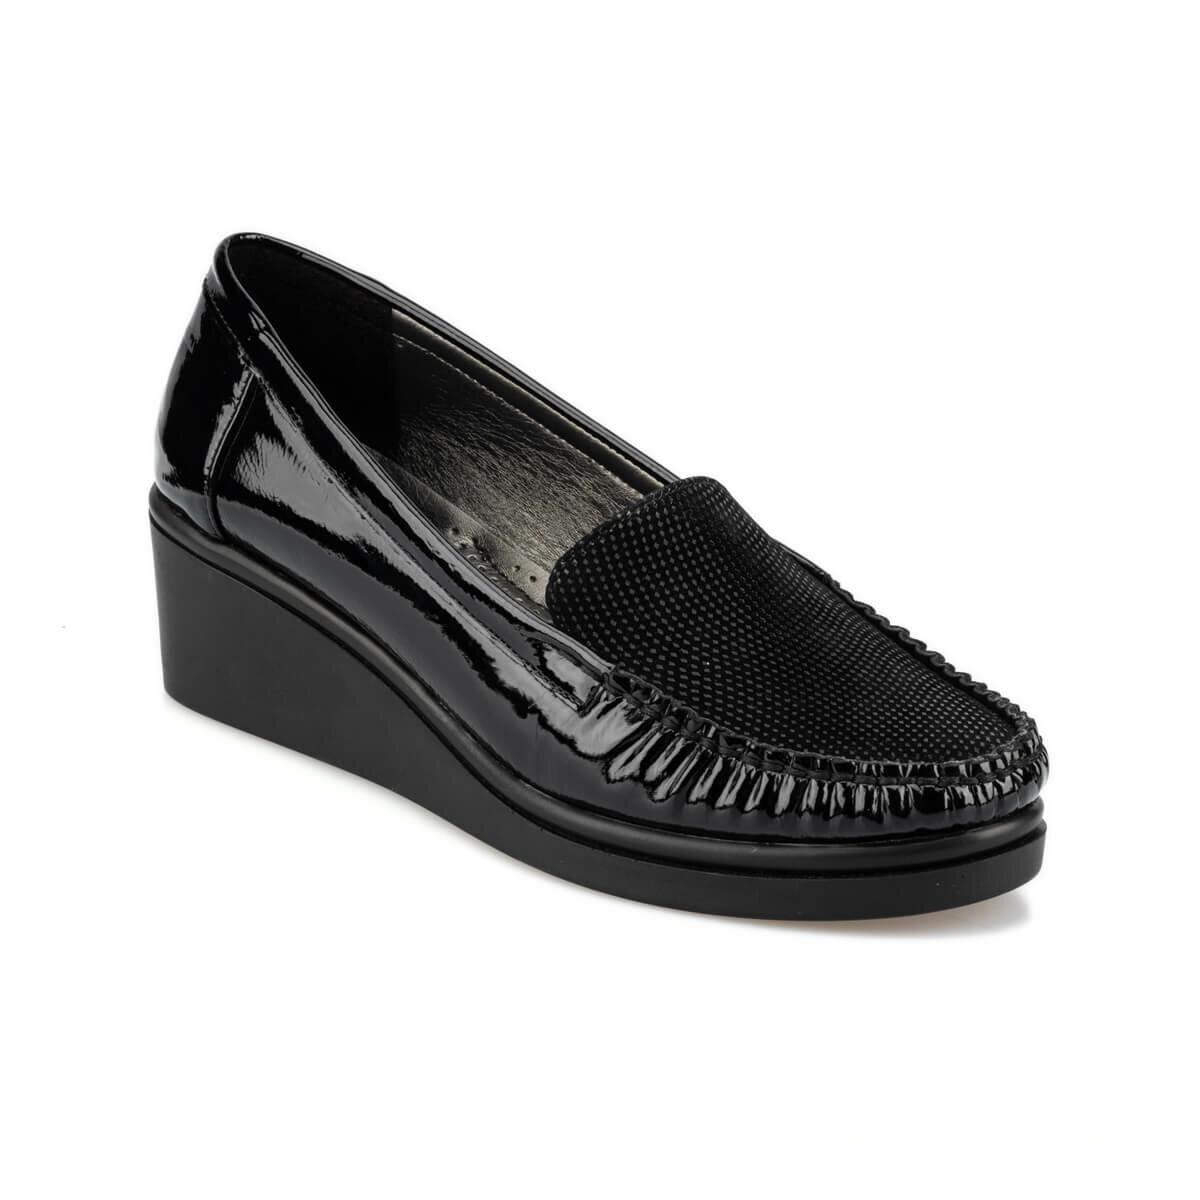 FLO 92.151041SZ Black Women Loafer Shoes Polaris